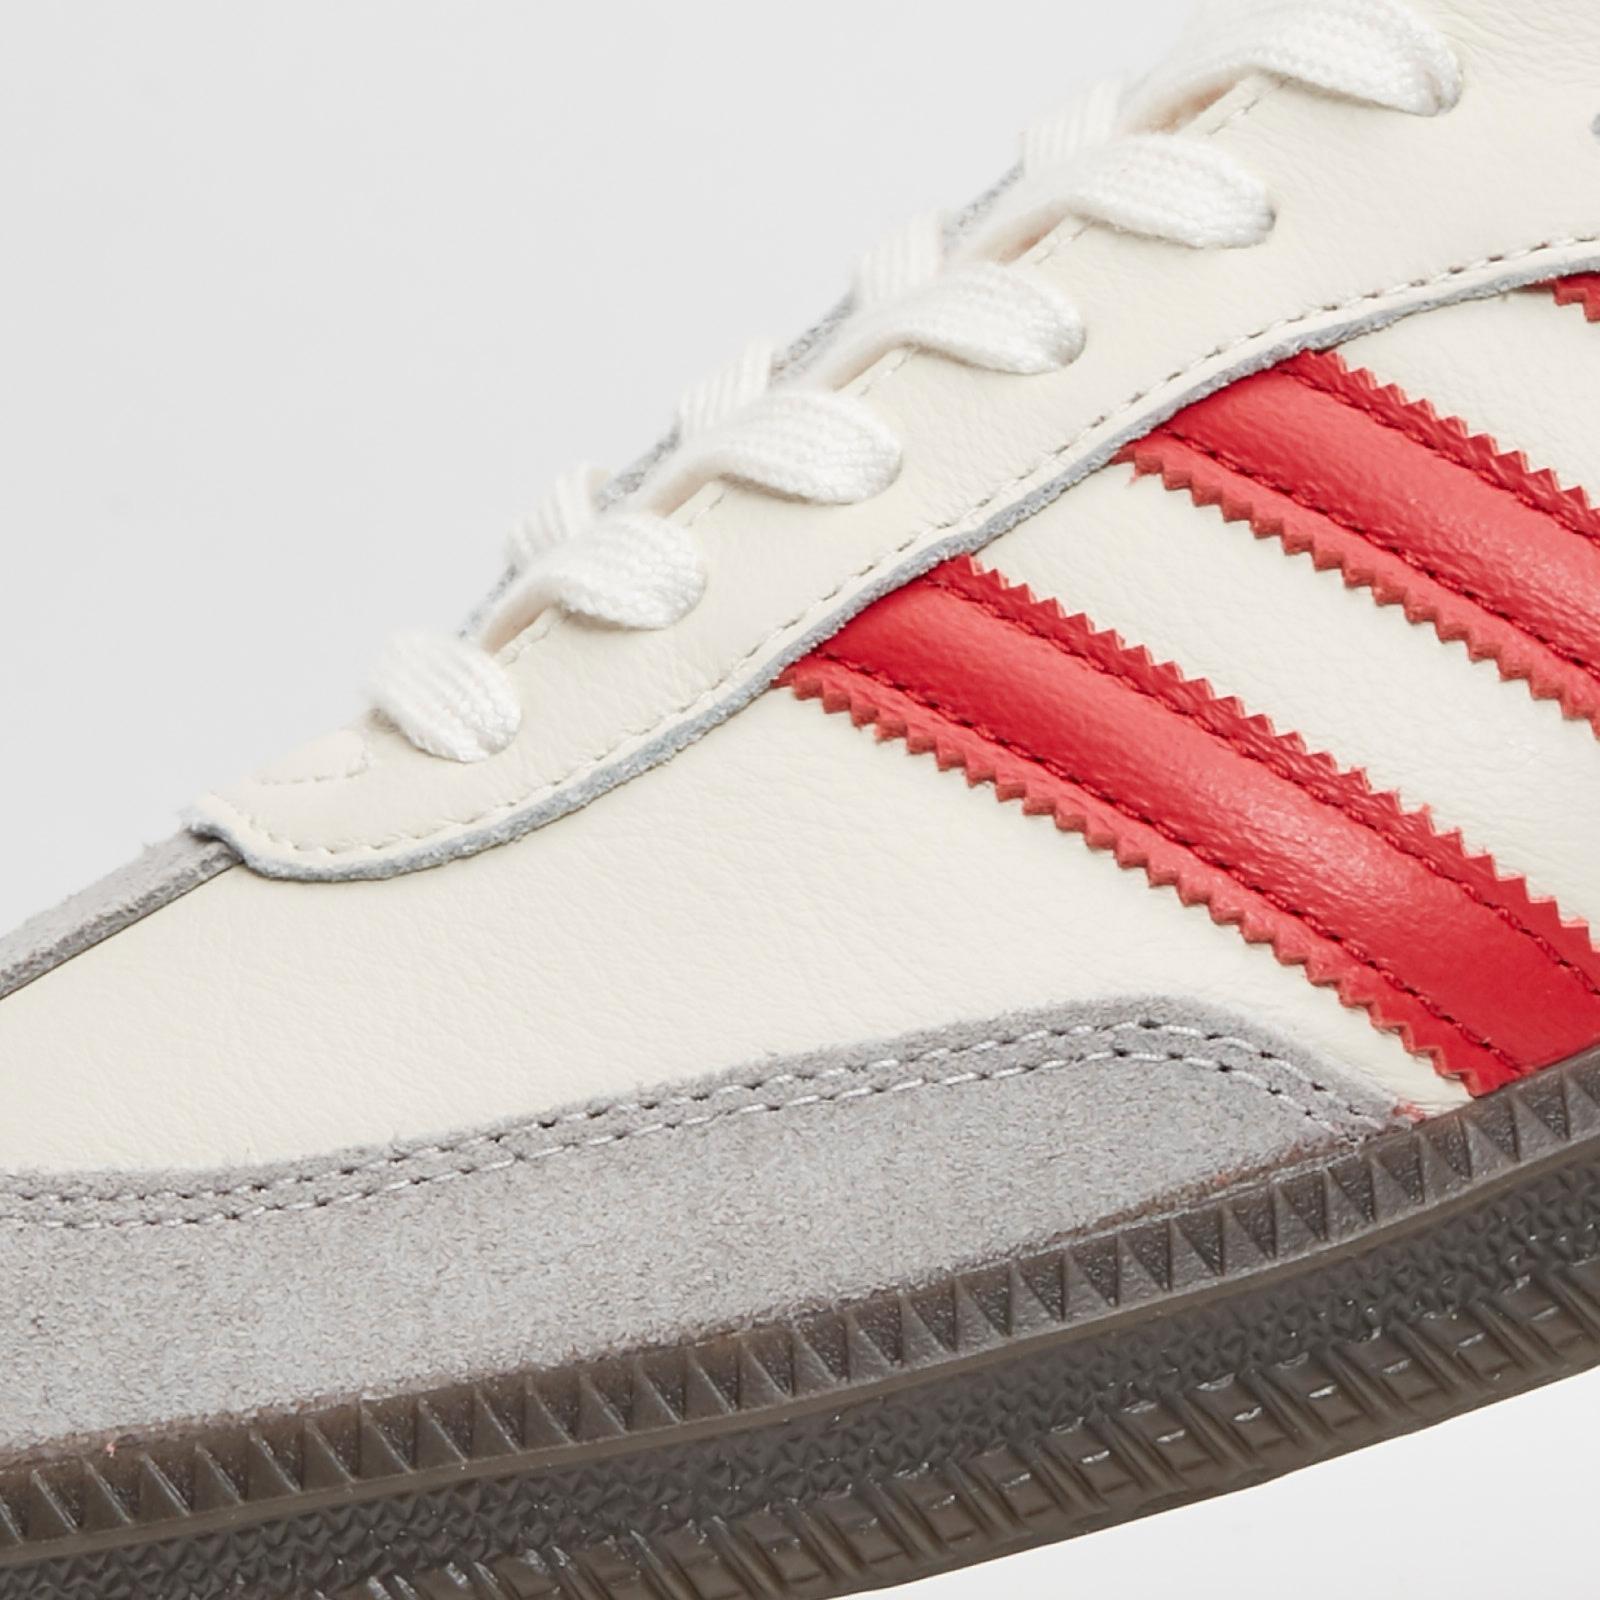 adidas Samba Classic OG - Cq2216 - Sneakersnstuff  c8b9a308f